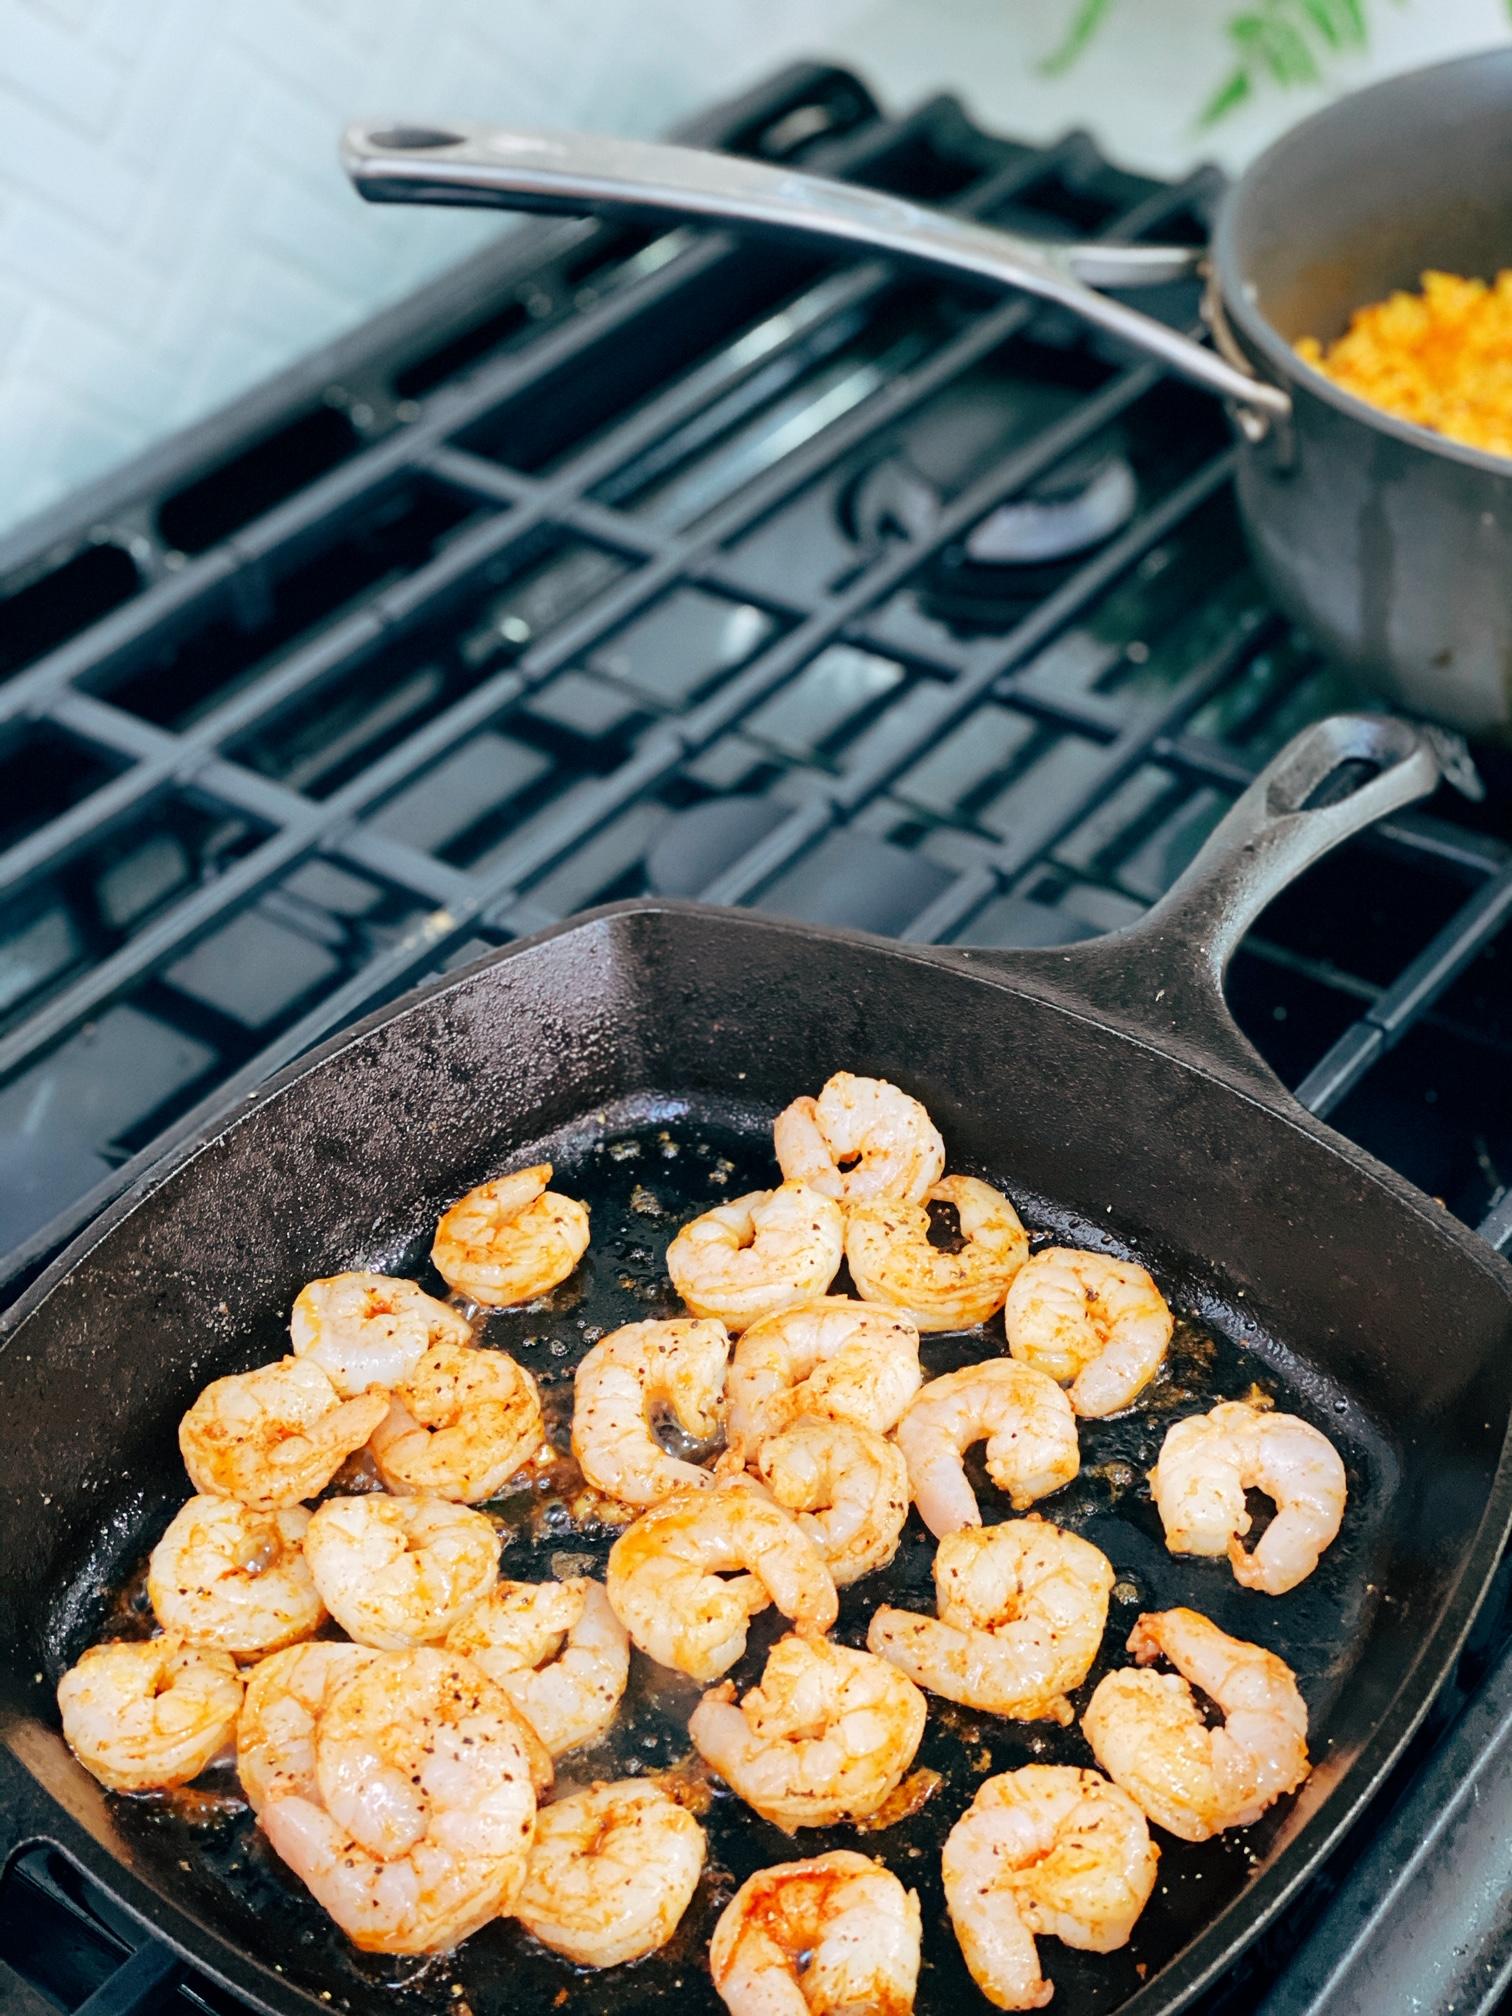 shrimp paella, spanish paella, food for parties, rice recipe, shrimp recipes, easy dinner recipes, chorizo recipes, shrimp and chorizo paella, spanish recipes, authentic spanish recipes